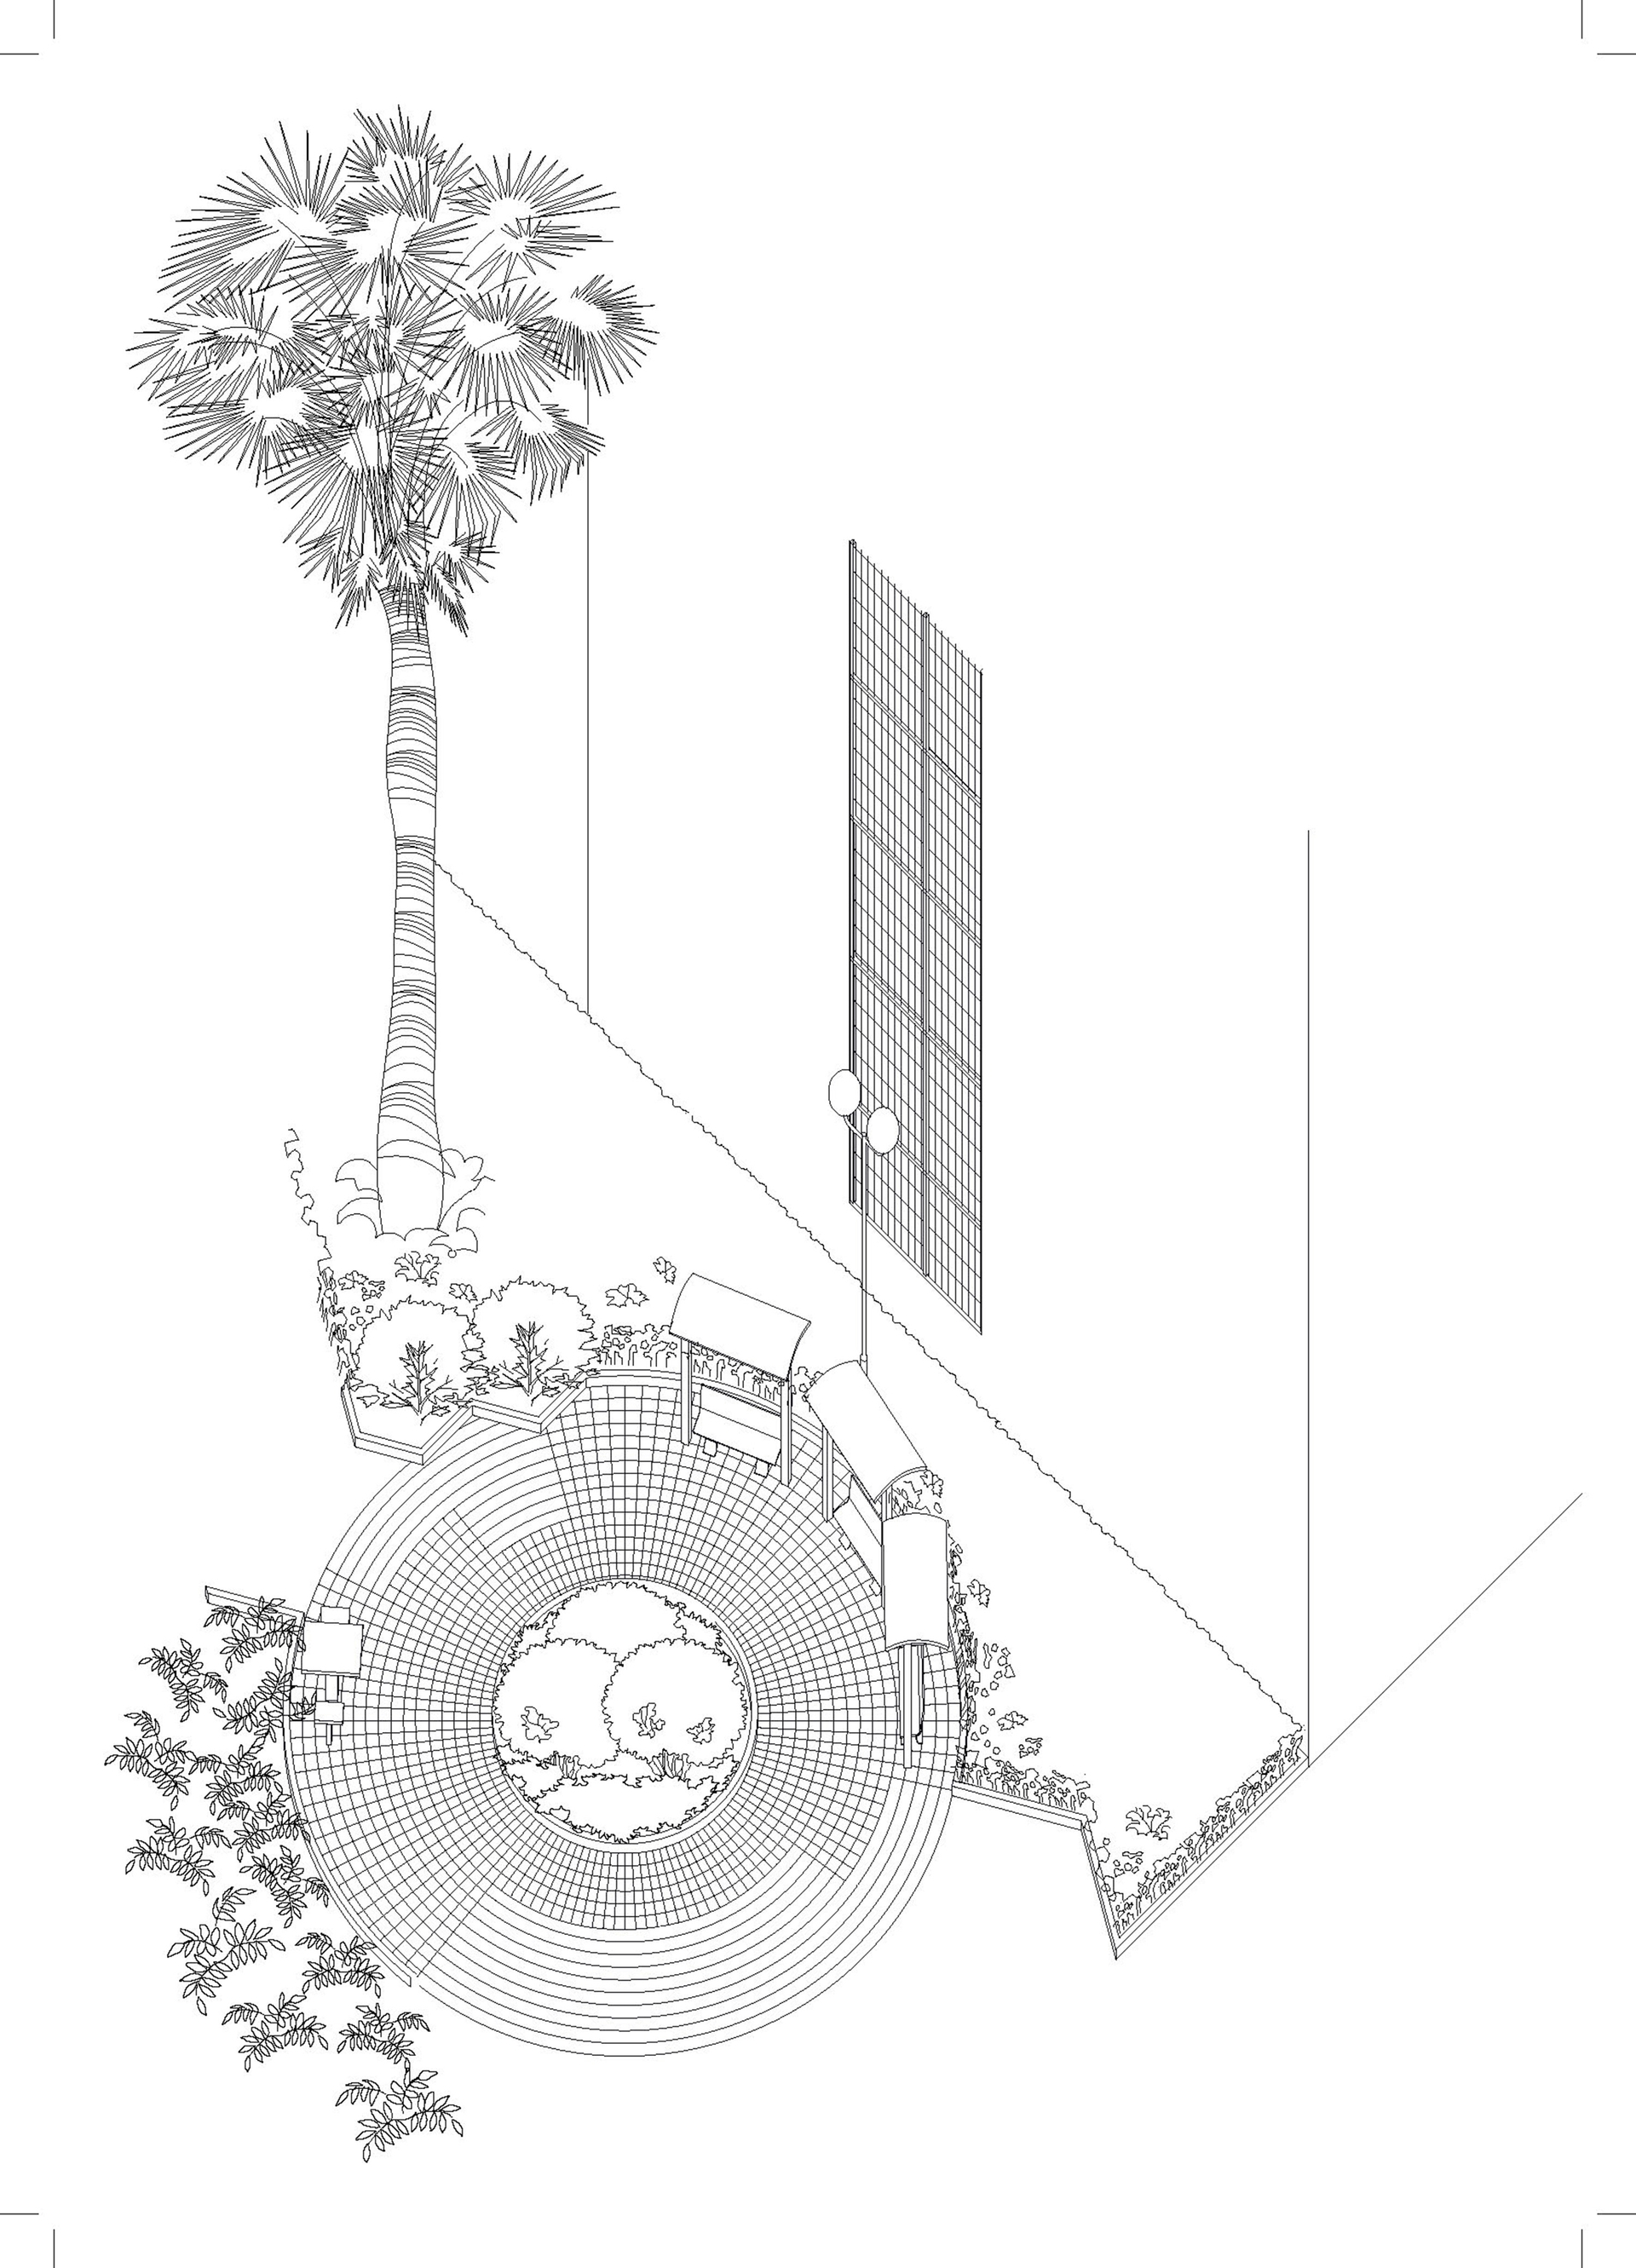 Enlarge Photo: Project 1 - (Inter)positioning: Portland Street Rest Garden Spatial Axon. By ZHOU Yifan Mia.